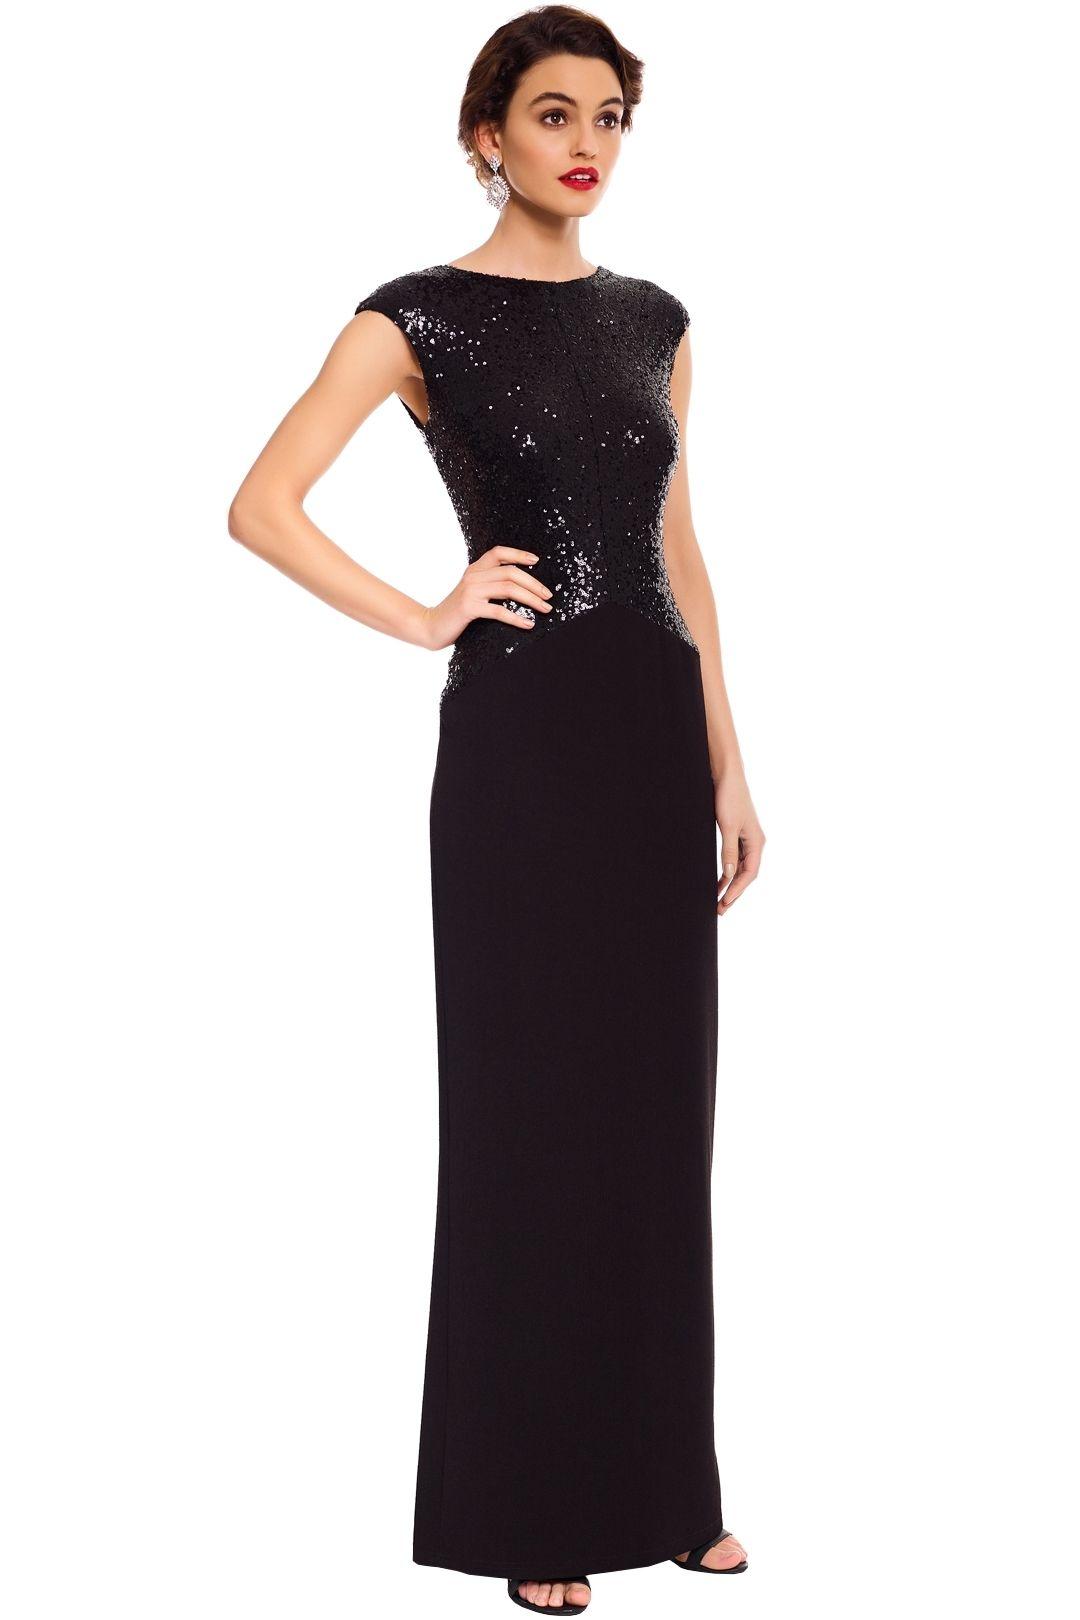 Elle Zeitoune - Ruby Black Gown - Black - Side